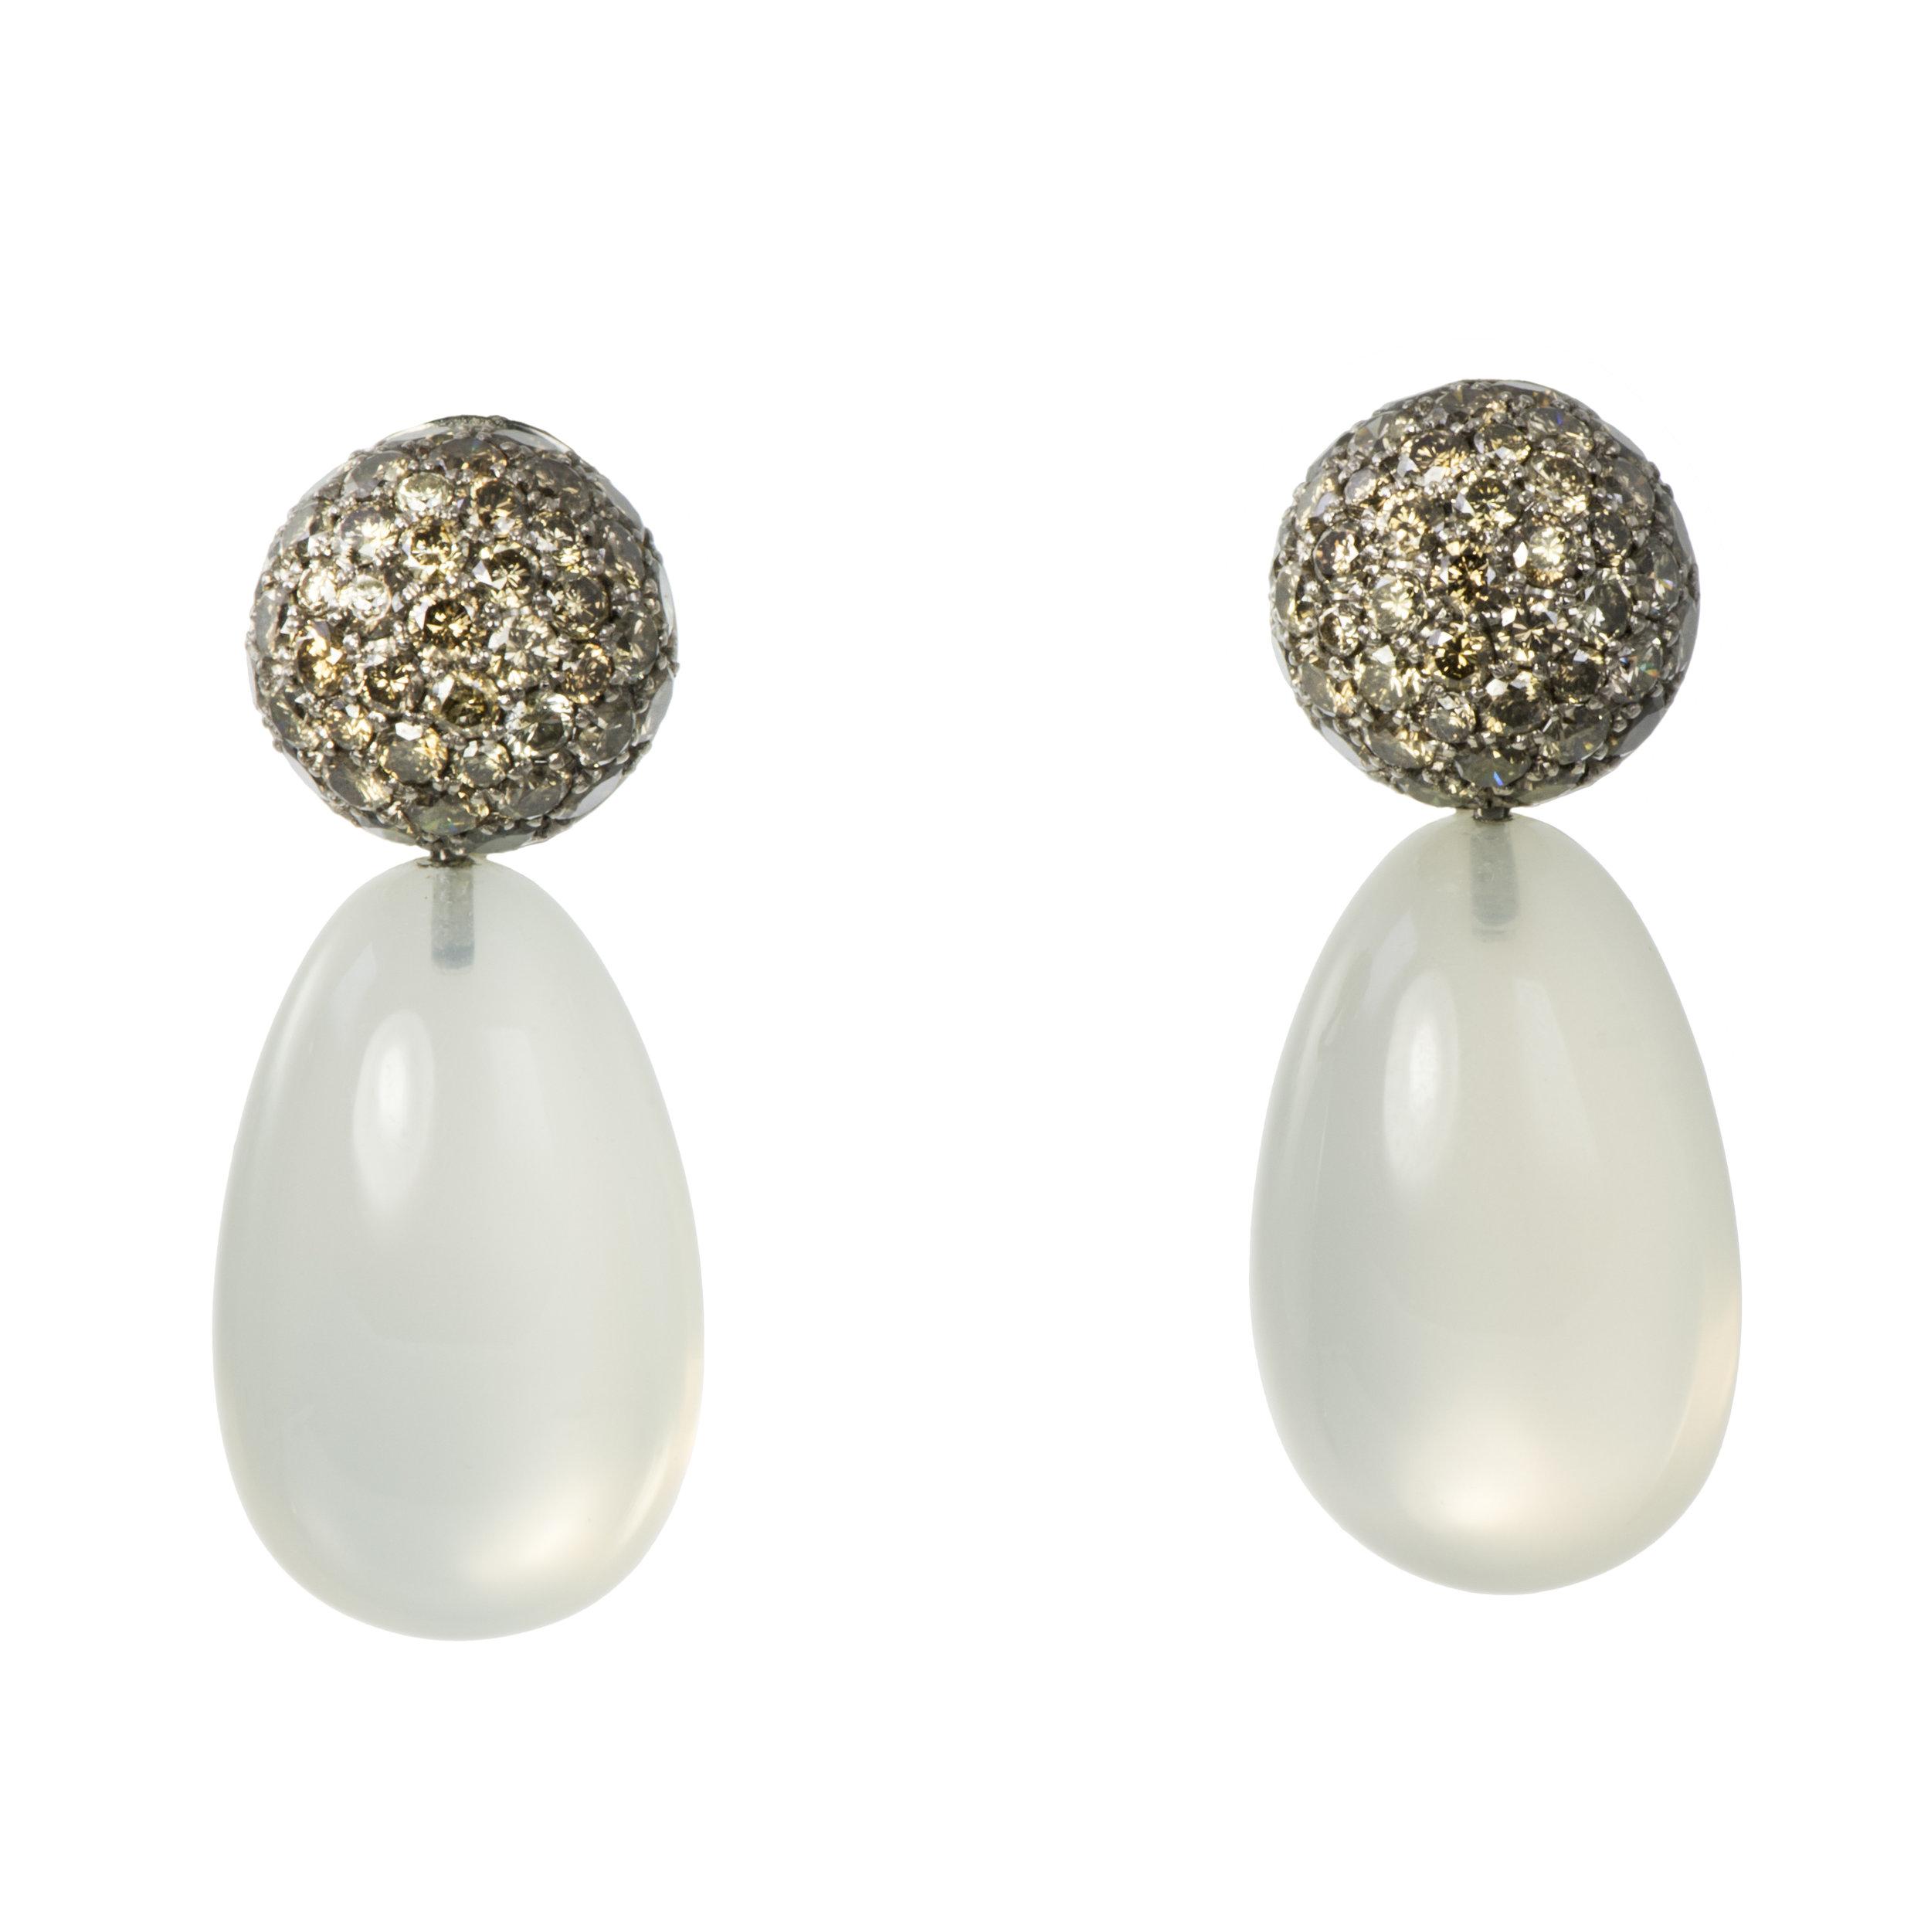 A pair of moonstone and orange-brown colored diamond pendant earrings, Hemmerle, Germany, c. 2000s